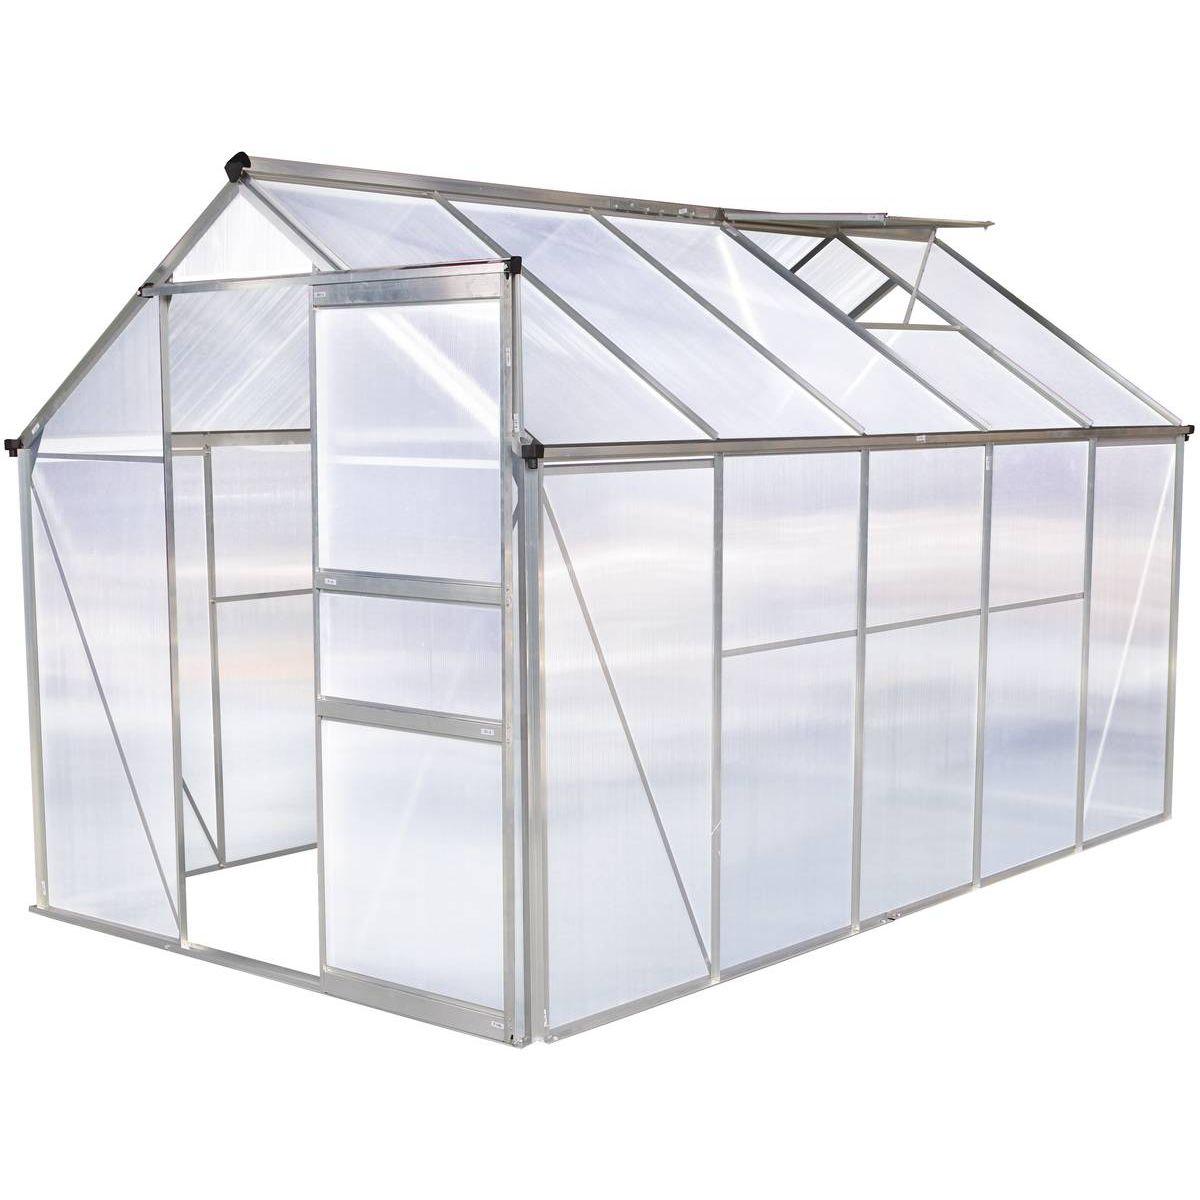 "Serre Jardin Polycarbonate ""hortensia""6M² - Taille : Taille ... destiné Serre De Jardin Polycarbonate Pas Cher"